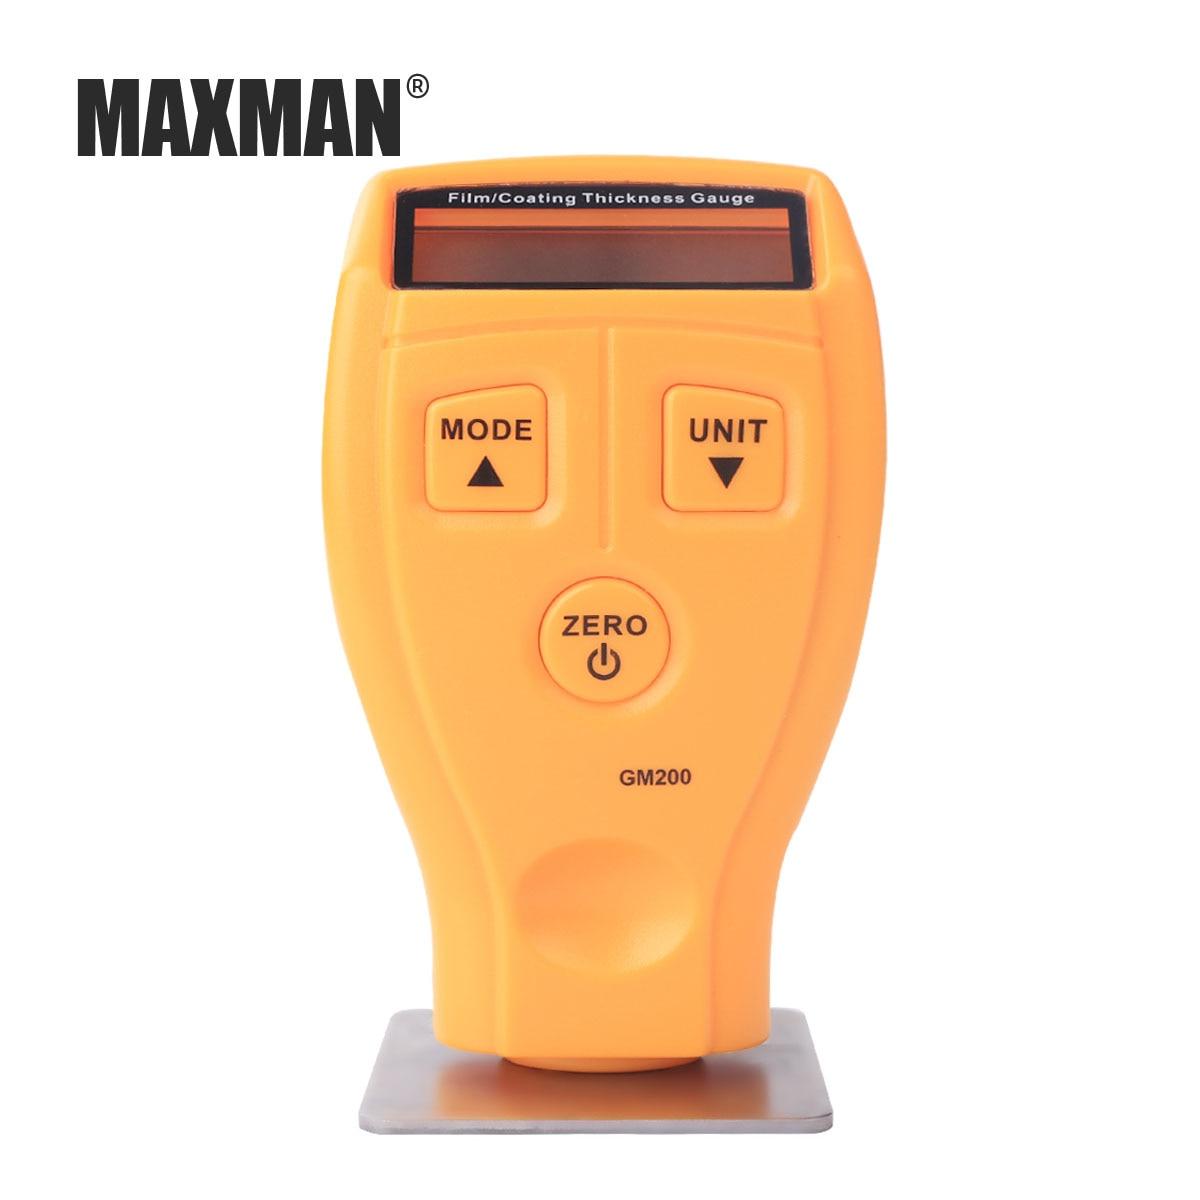 MAXMAN Mini Digital Automotive 0-1.80mm range Paint Coating Thickness Gauge Car Paint Thickness Meter Tester Car Diagnostic Tool digital automotive coating ultrasonic paint iron thickness gauge meter tool